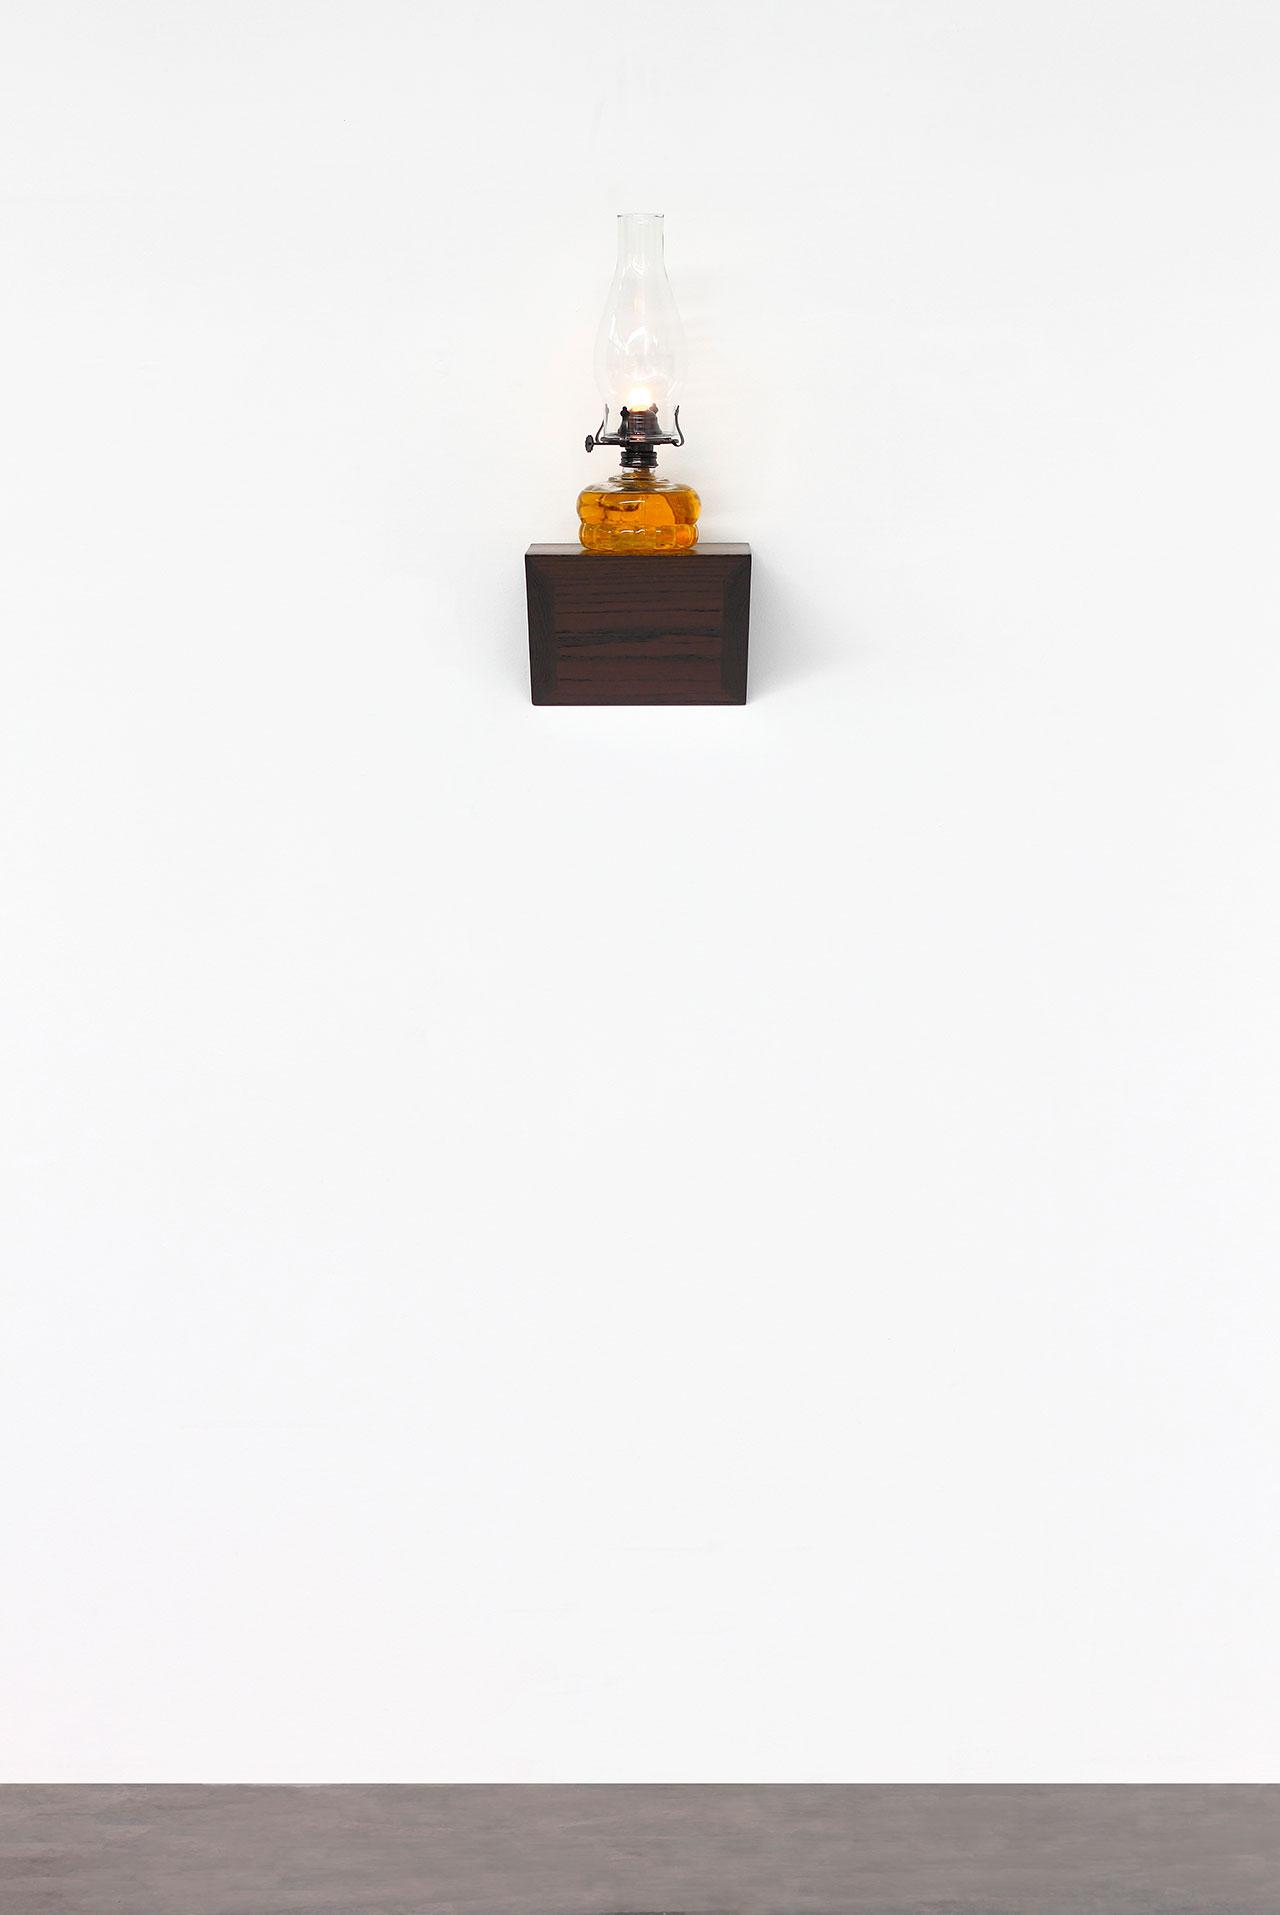 Untitled 2015 Wood, oil lamp 45 x 20 x 20 cm Photo © Jorge Méndez Blake.